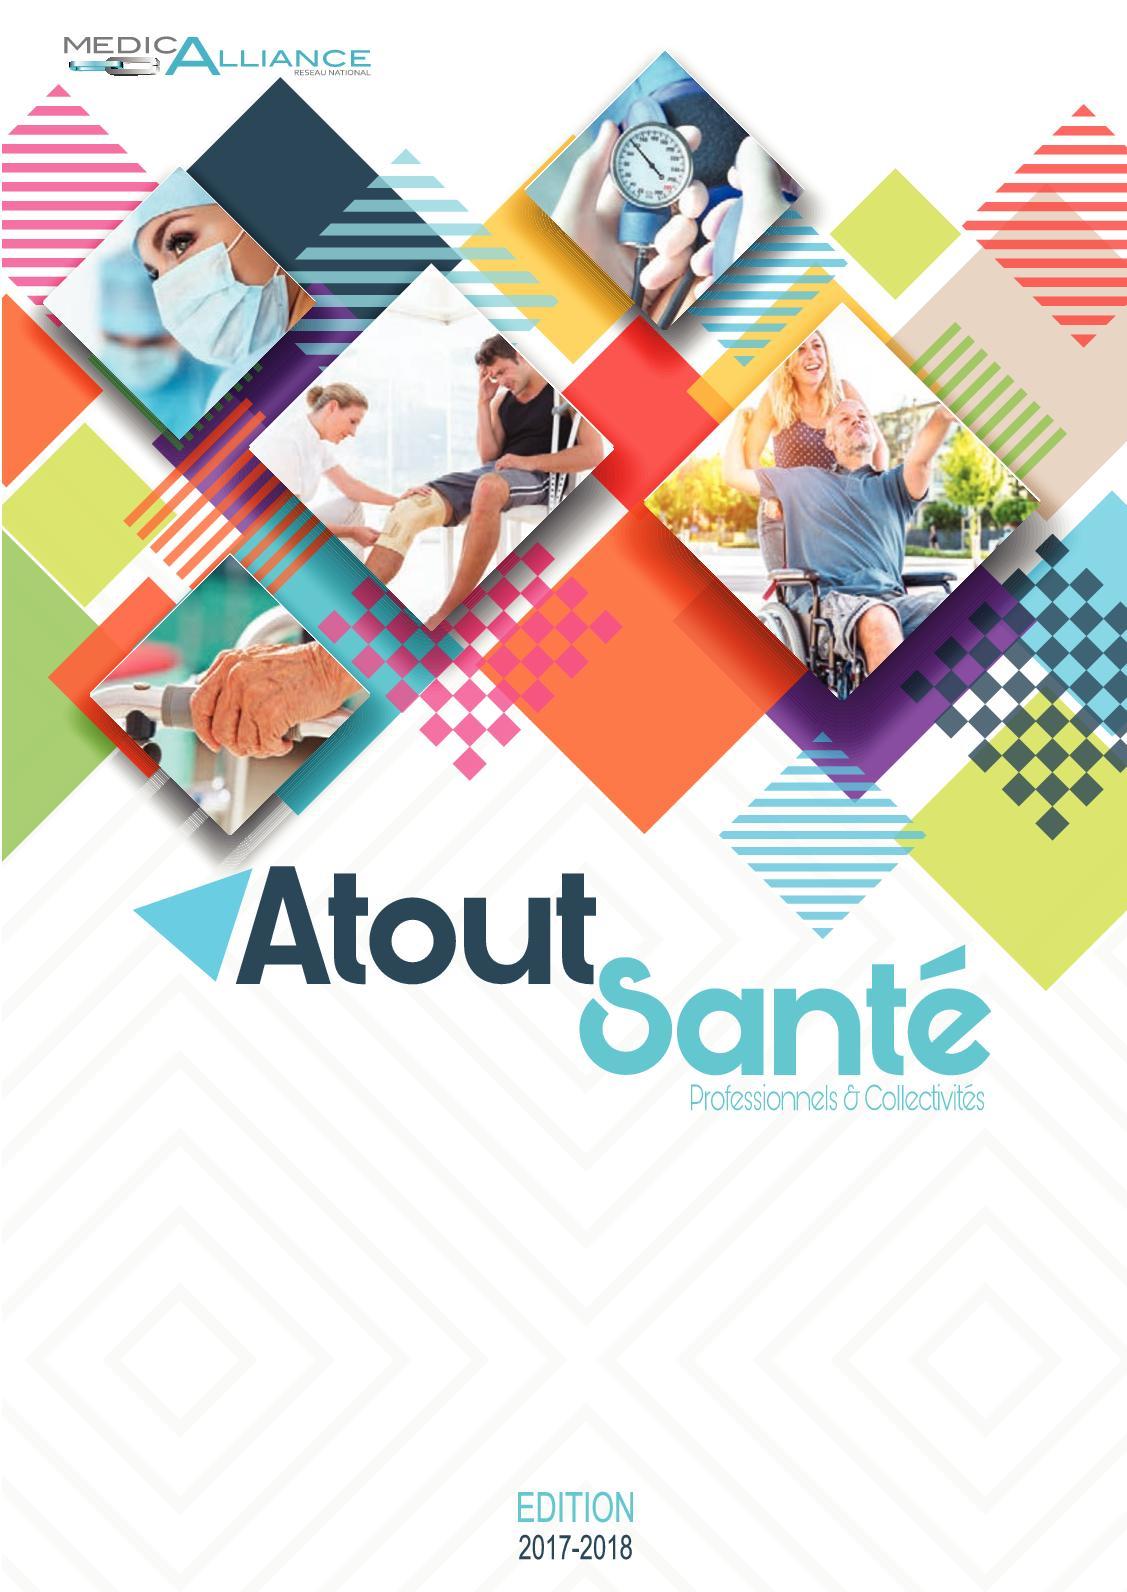 Calaméo - Atout Sante 2017 Bdf Compressed 001c1f3f98e